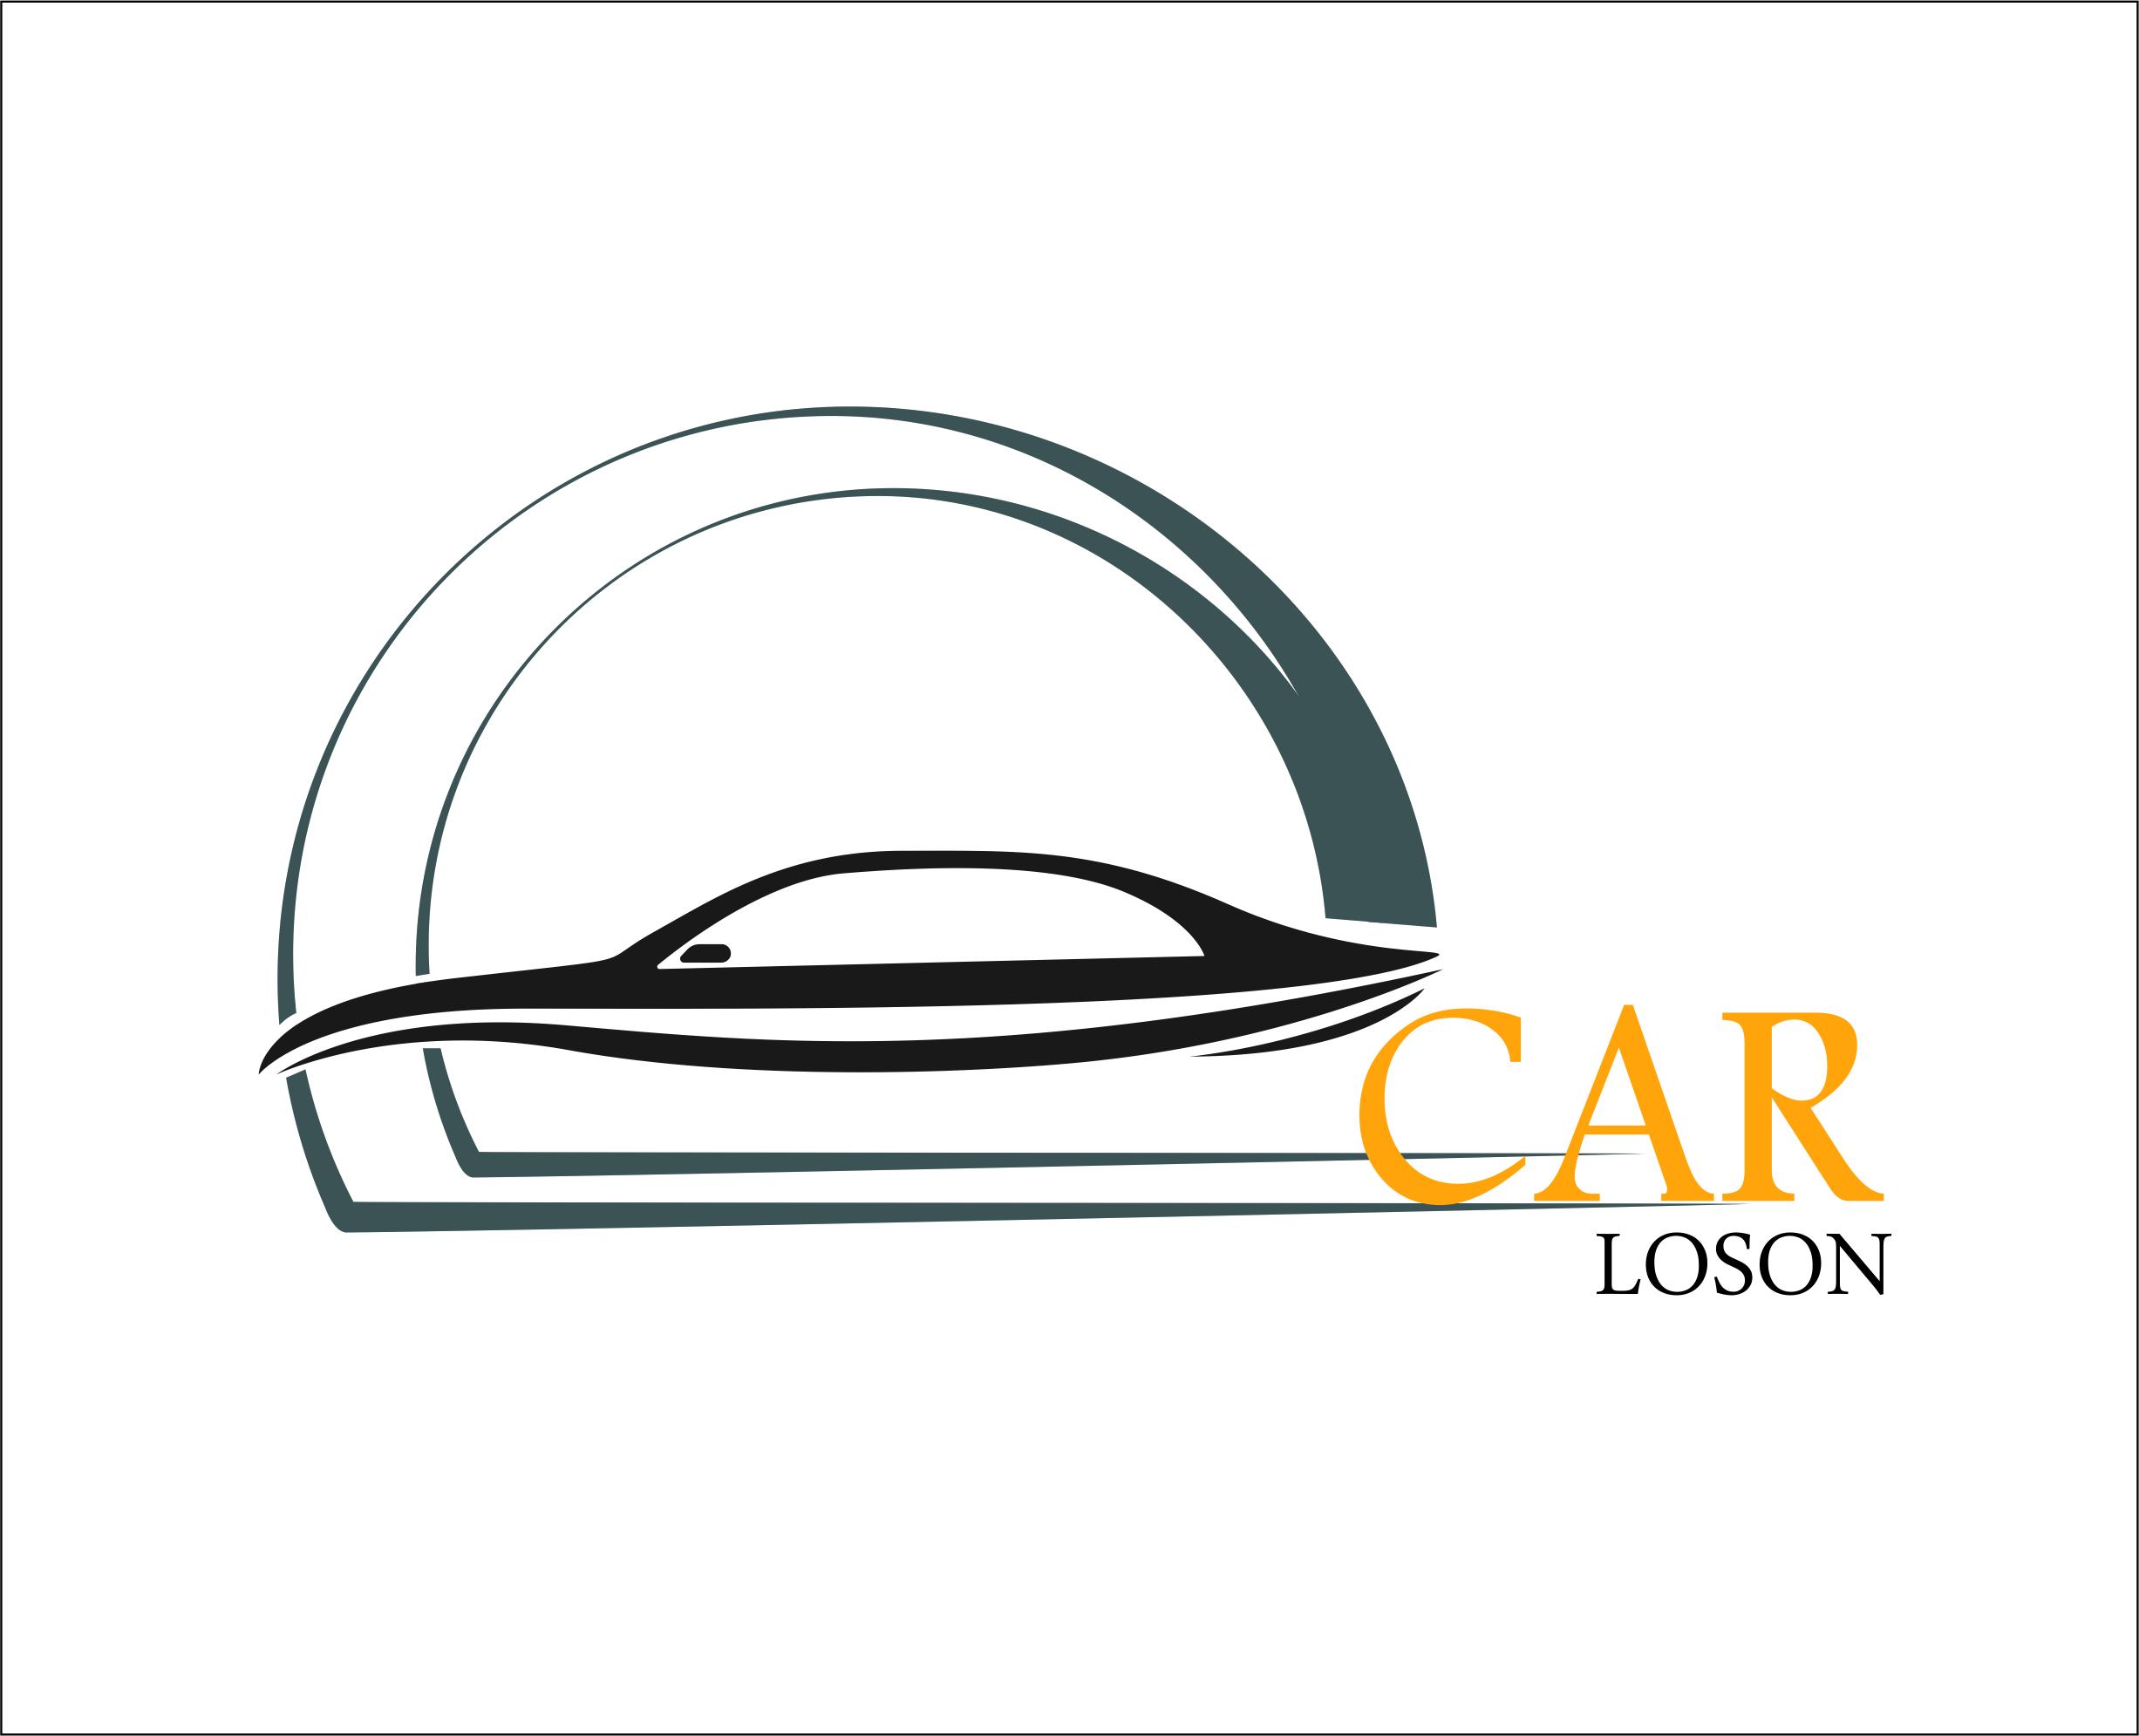 Логотип для компании по прокату  VIP автомобилей фото f_4185adcf66974ba5.jpg